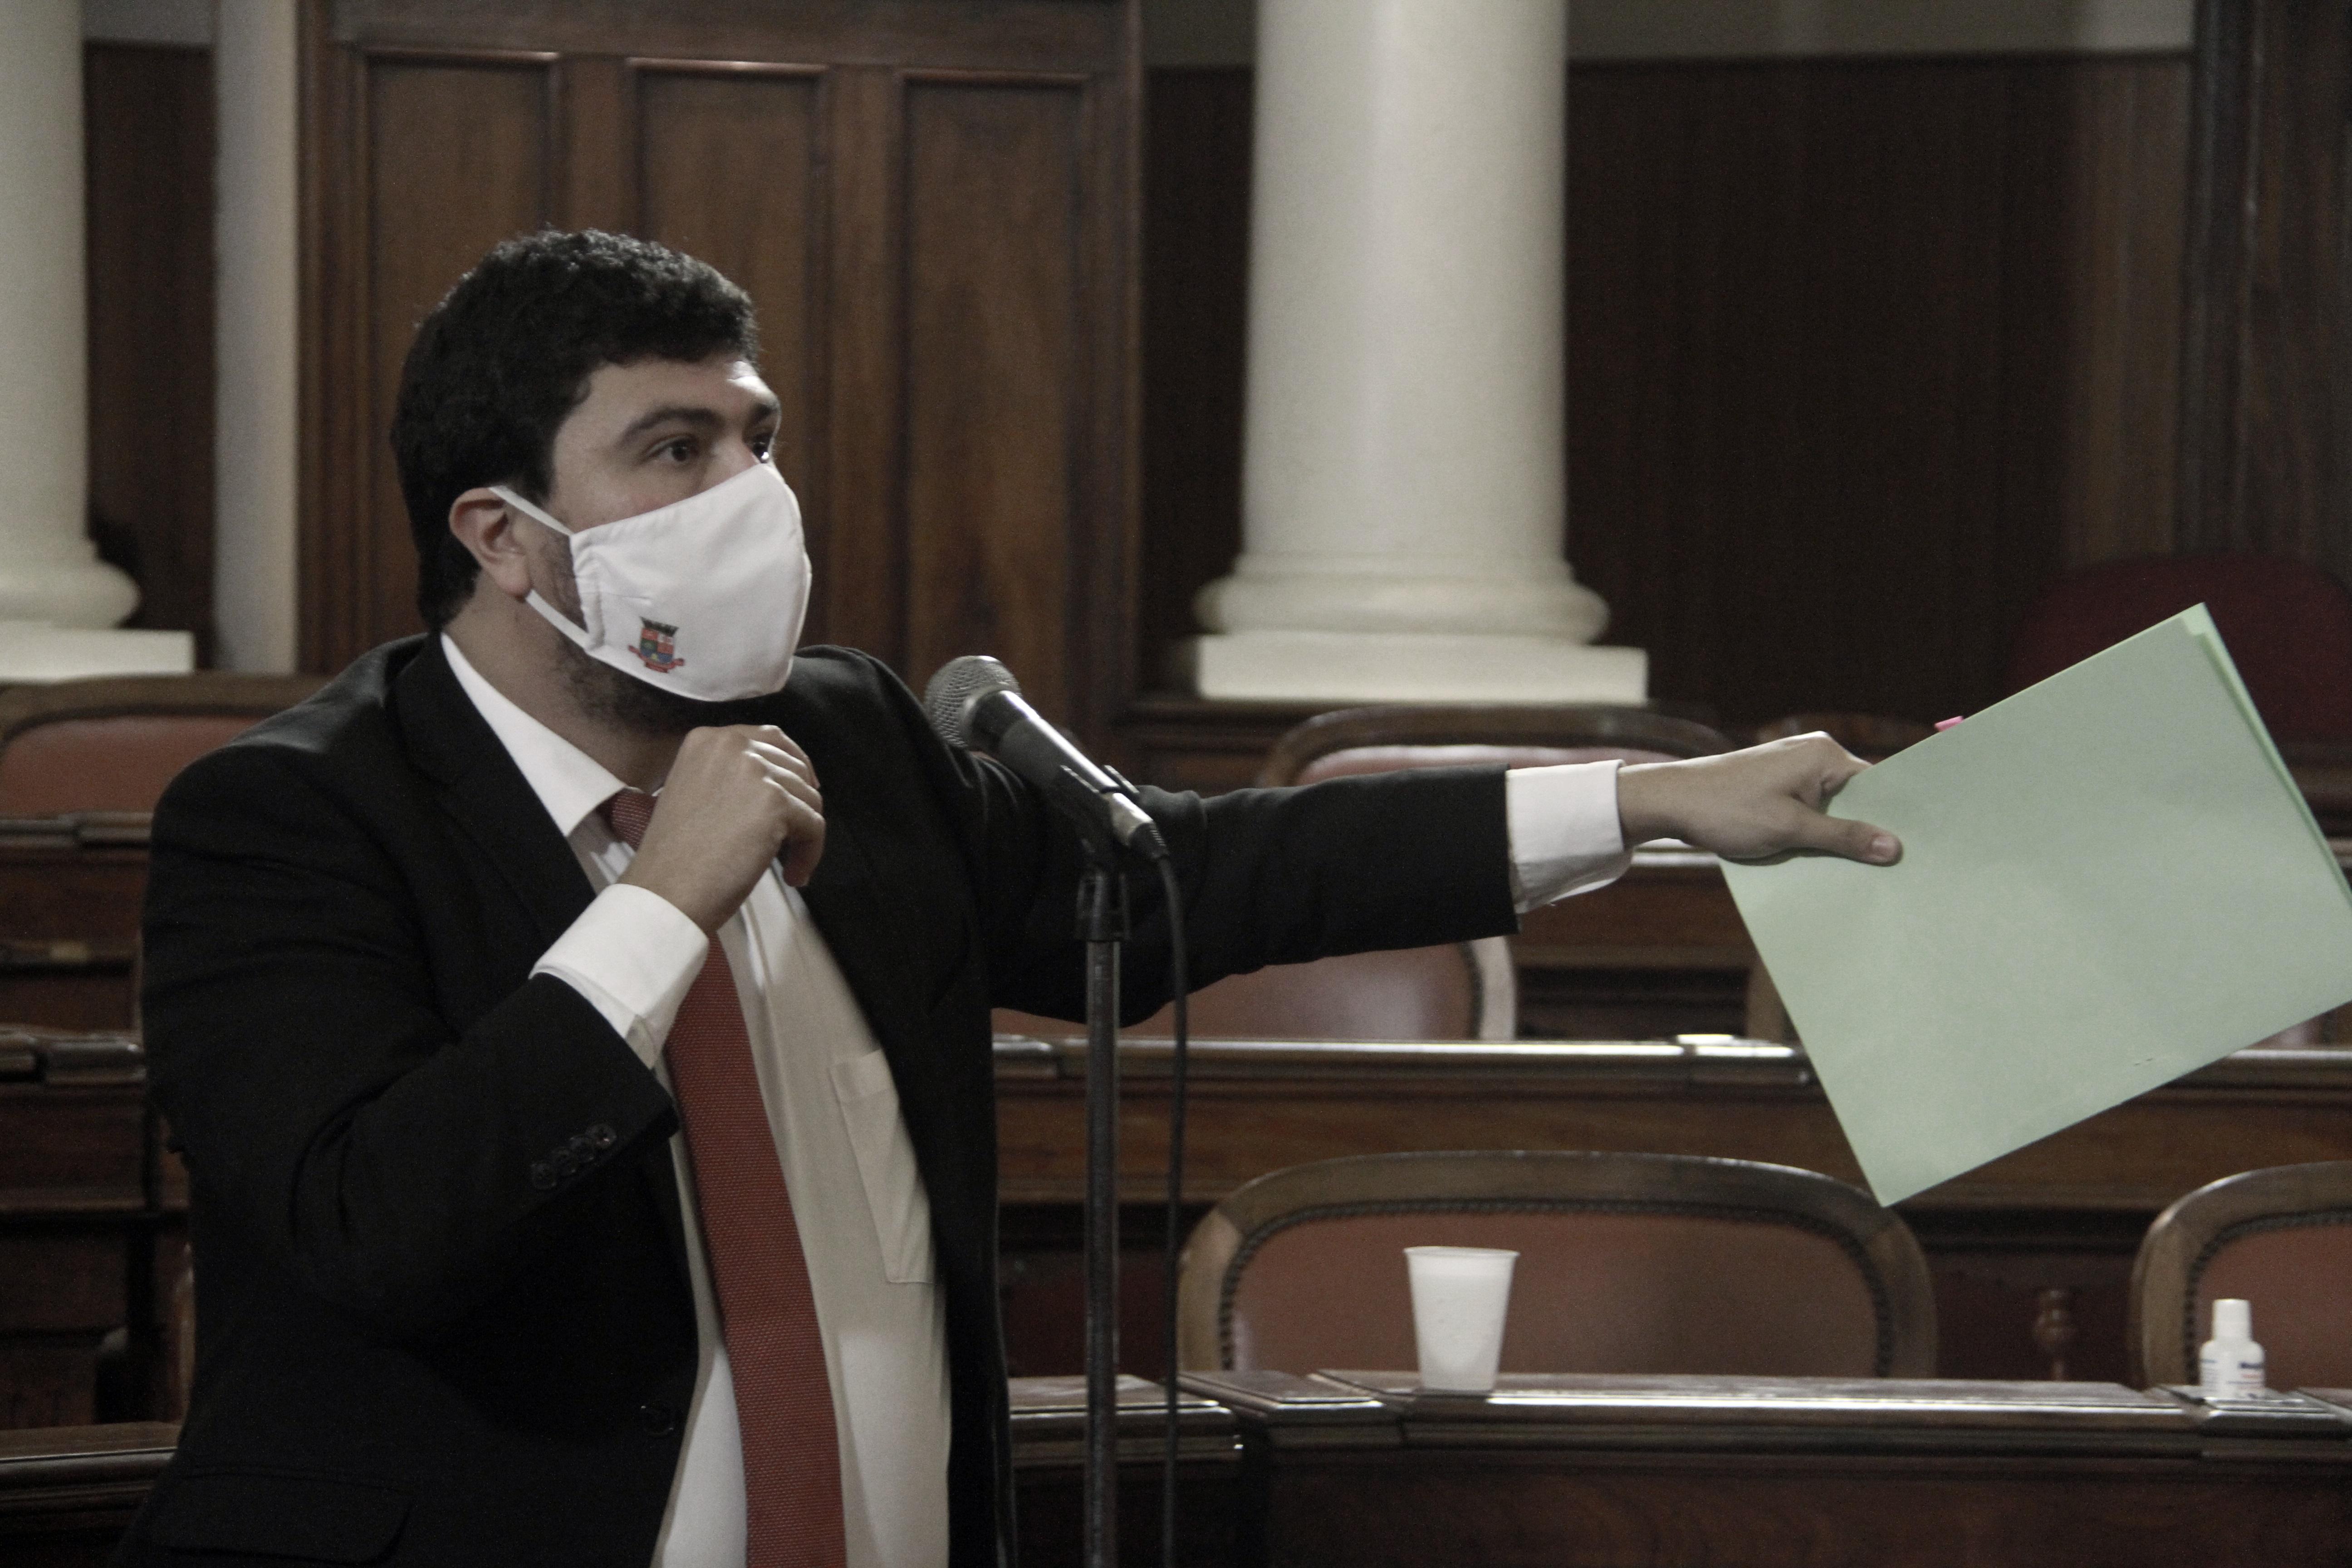 Vereador Bruno Lessa discursa após votar contra projeto que antecipa pagamento para empresas de ônibus (Foto Sergio Gomes / CMN)